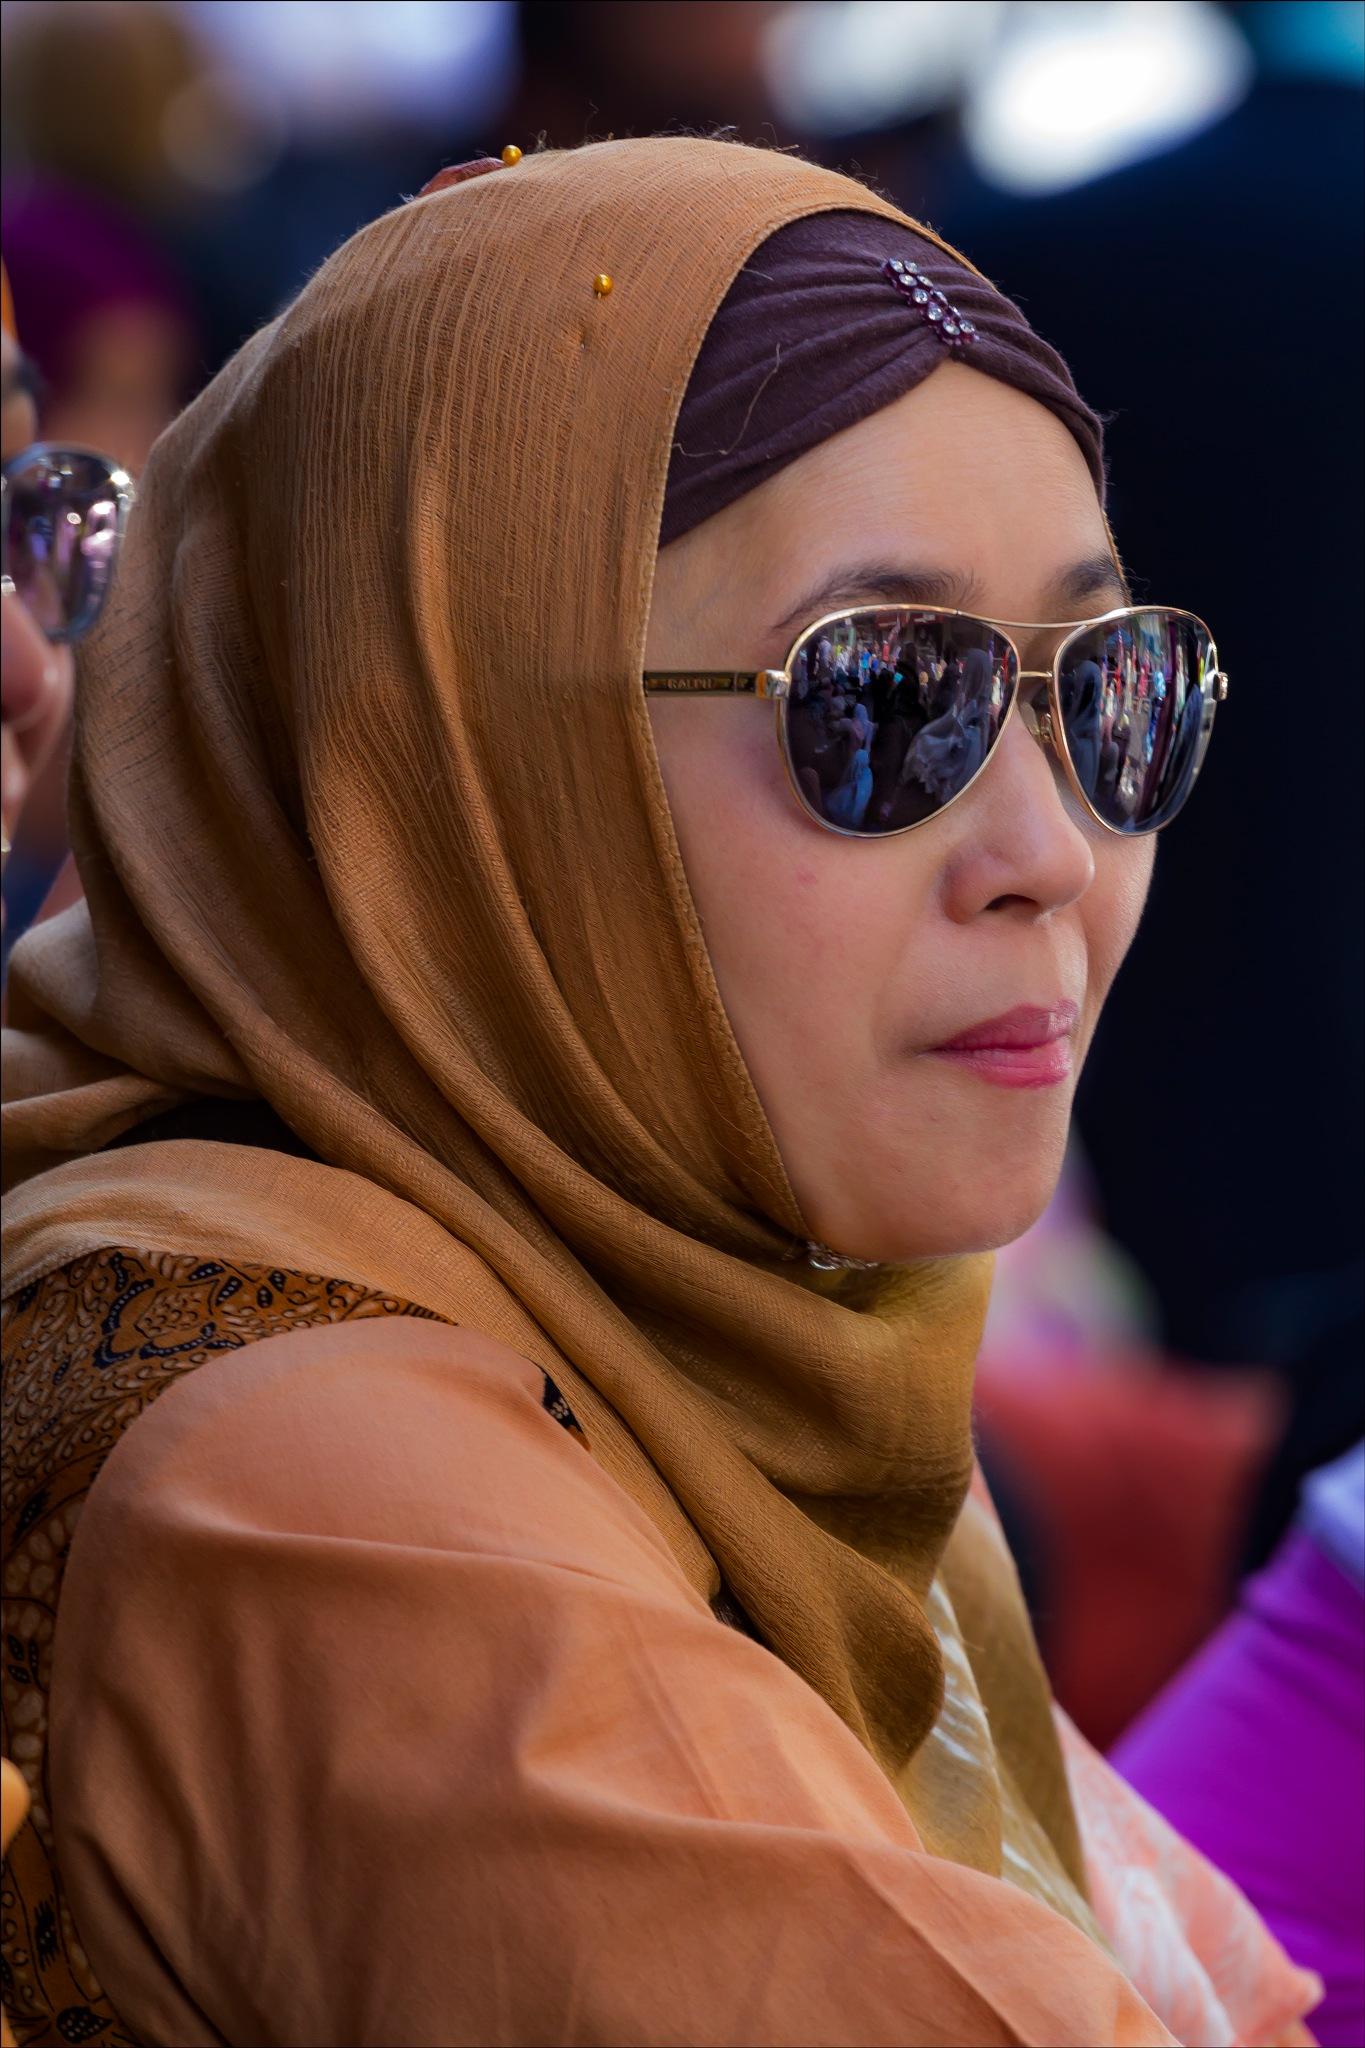 Moslem Woman Moslem Day NYC 2017 by robertullmann